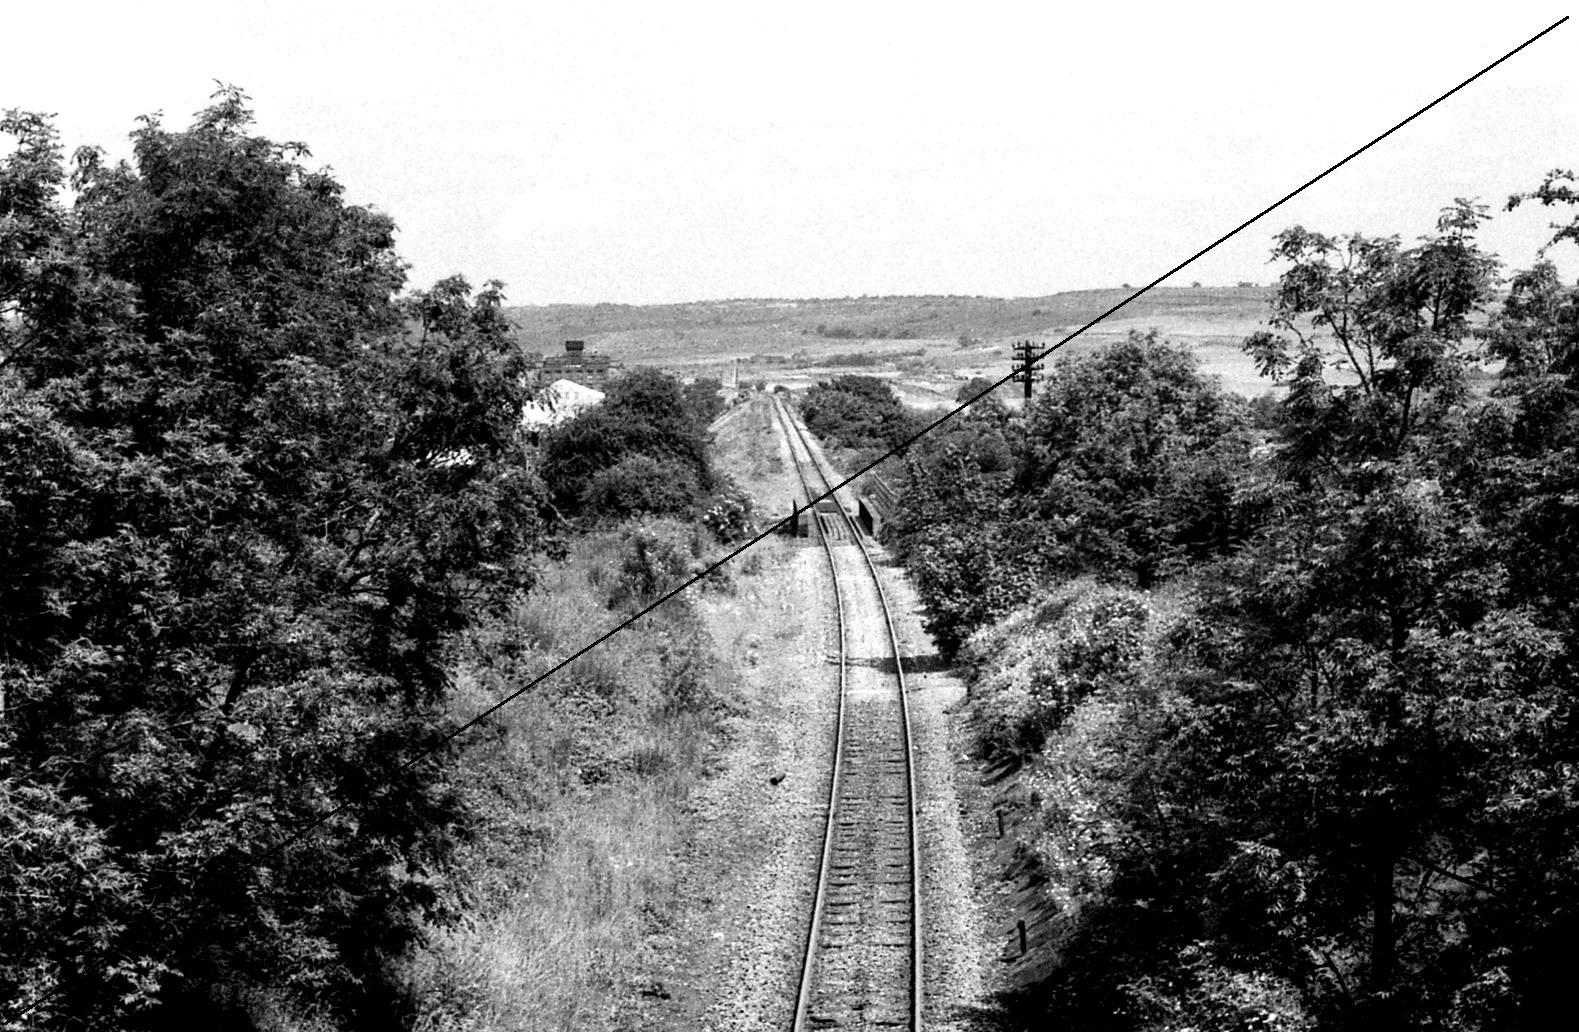 LDE003-Upperthorpe and Killamarsh Station Site-Looking North Towards Beighton-16-06-1977.jpg